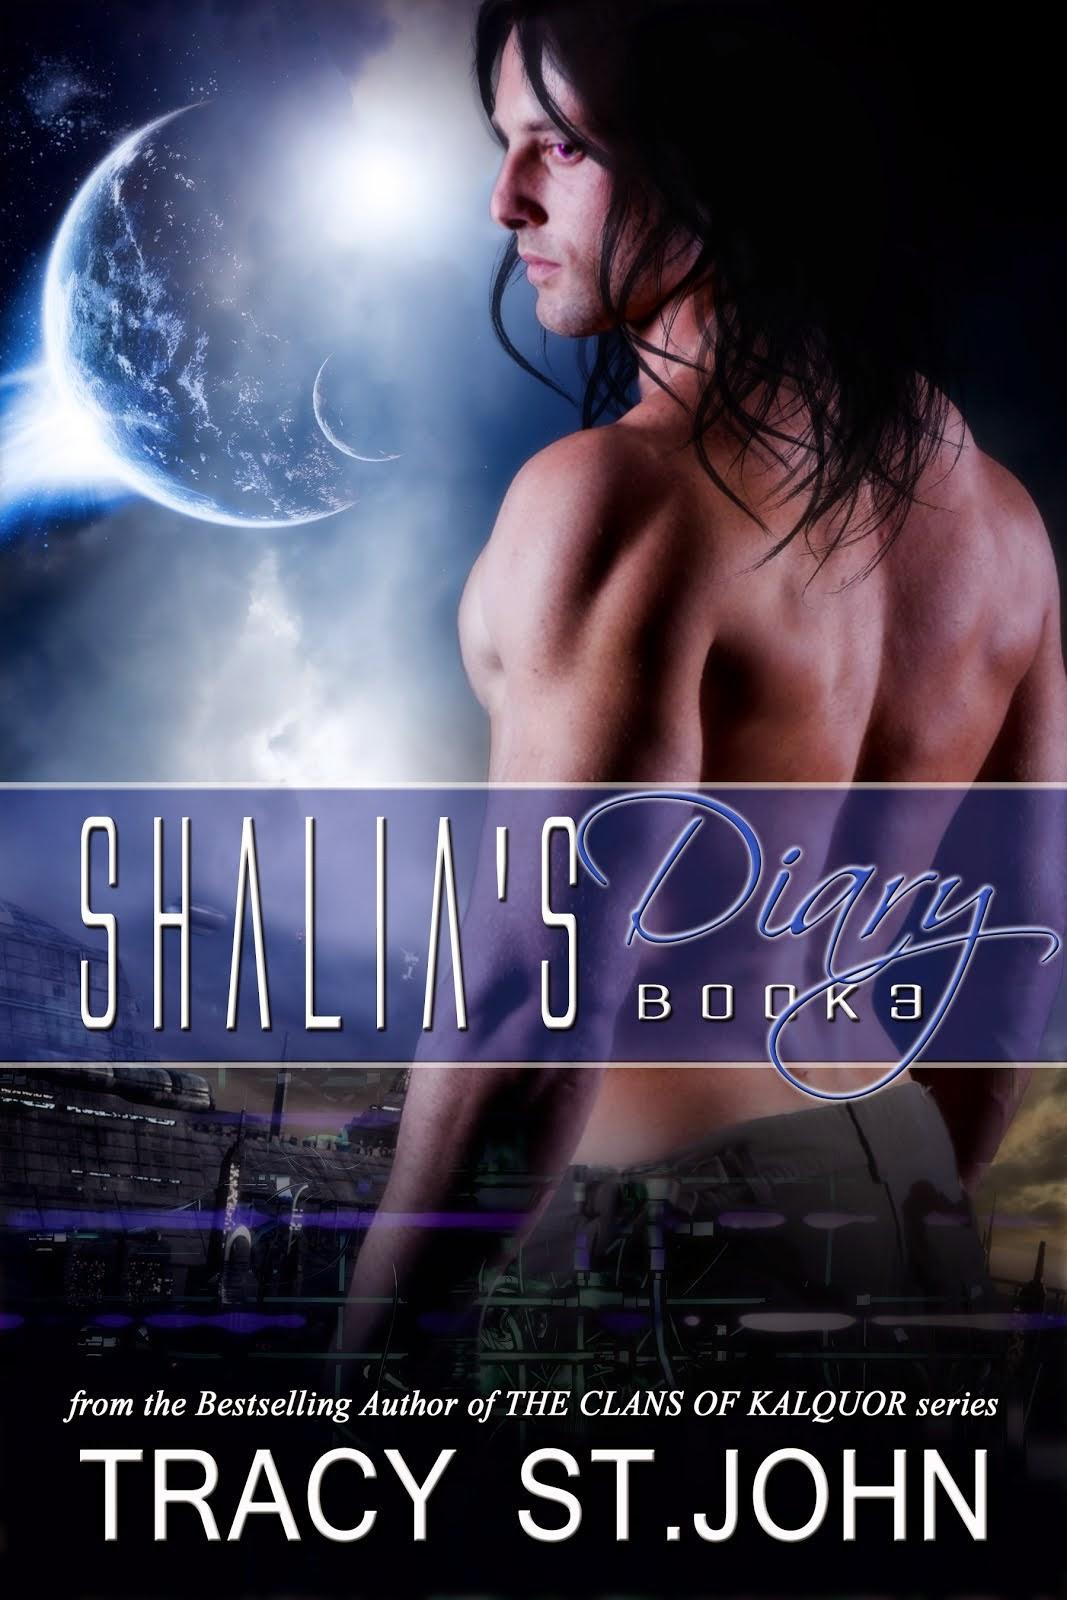 Shalia's Diary Book 3